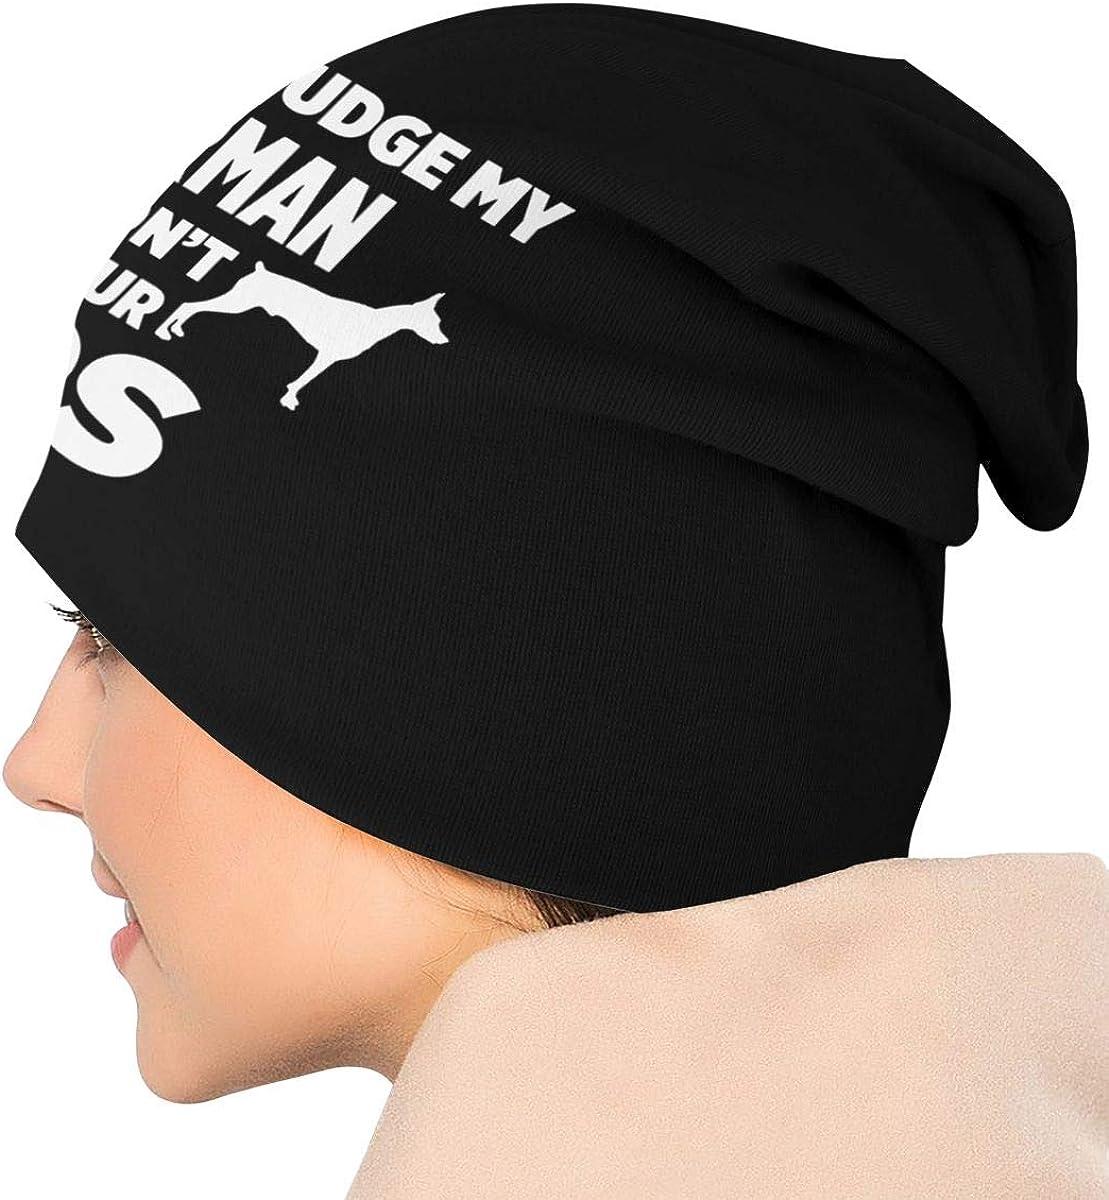 JINGUImao Don/â/€/™t Judge My Doberman I Won/â/€/™t Judge Your Unisex Warm Hat Knit Hat Skull Cap Beanies Cap